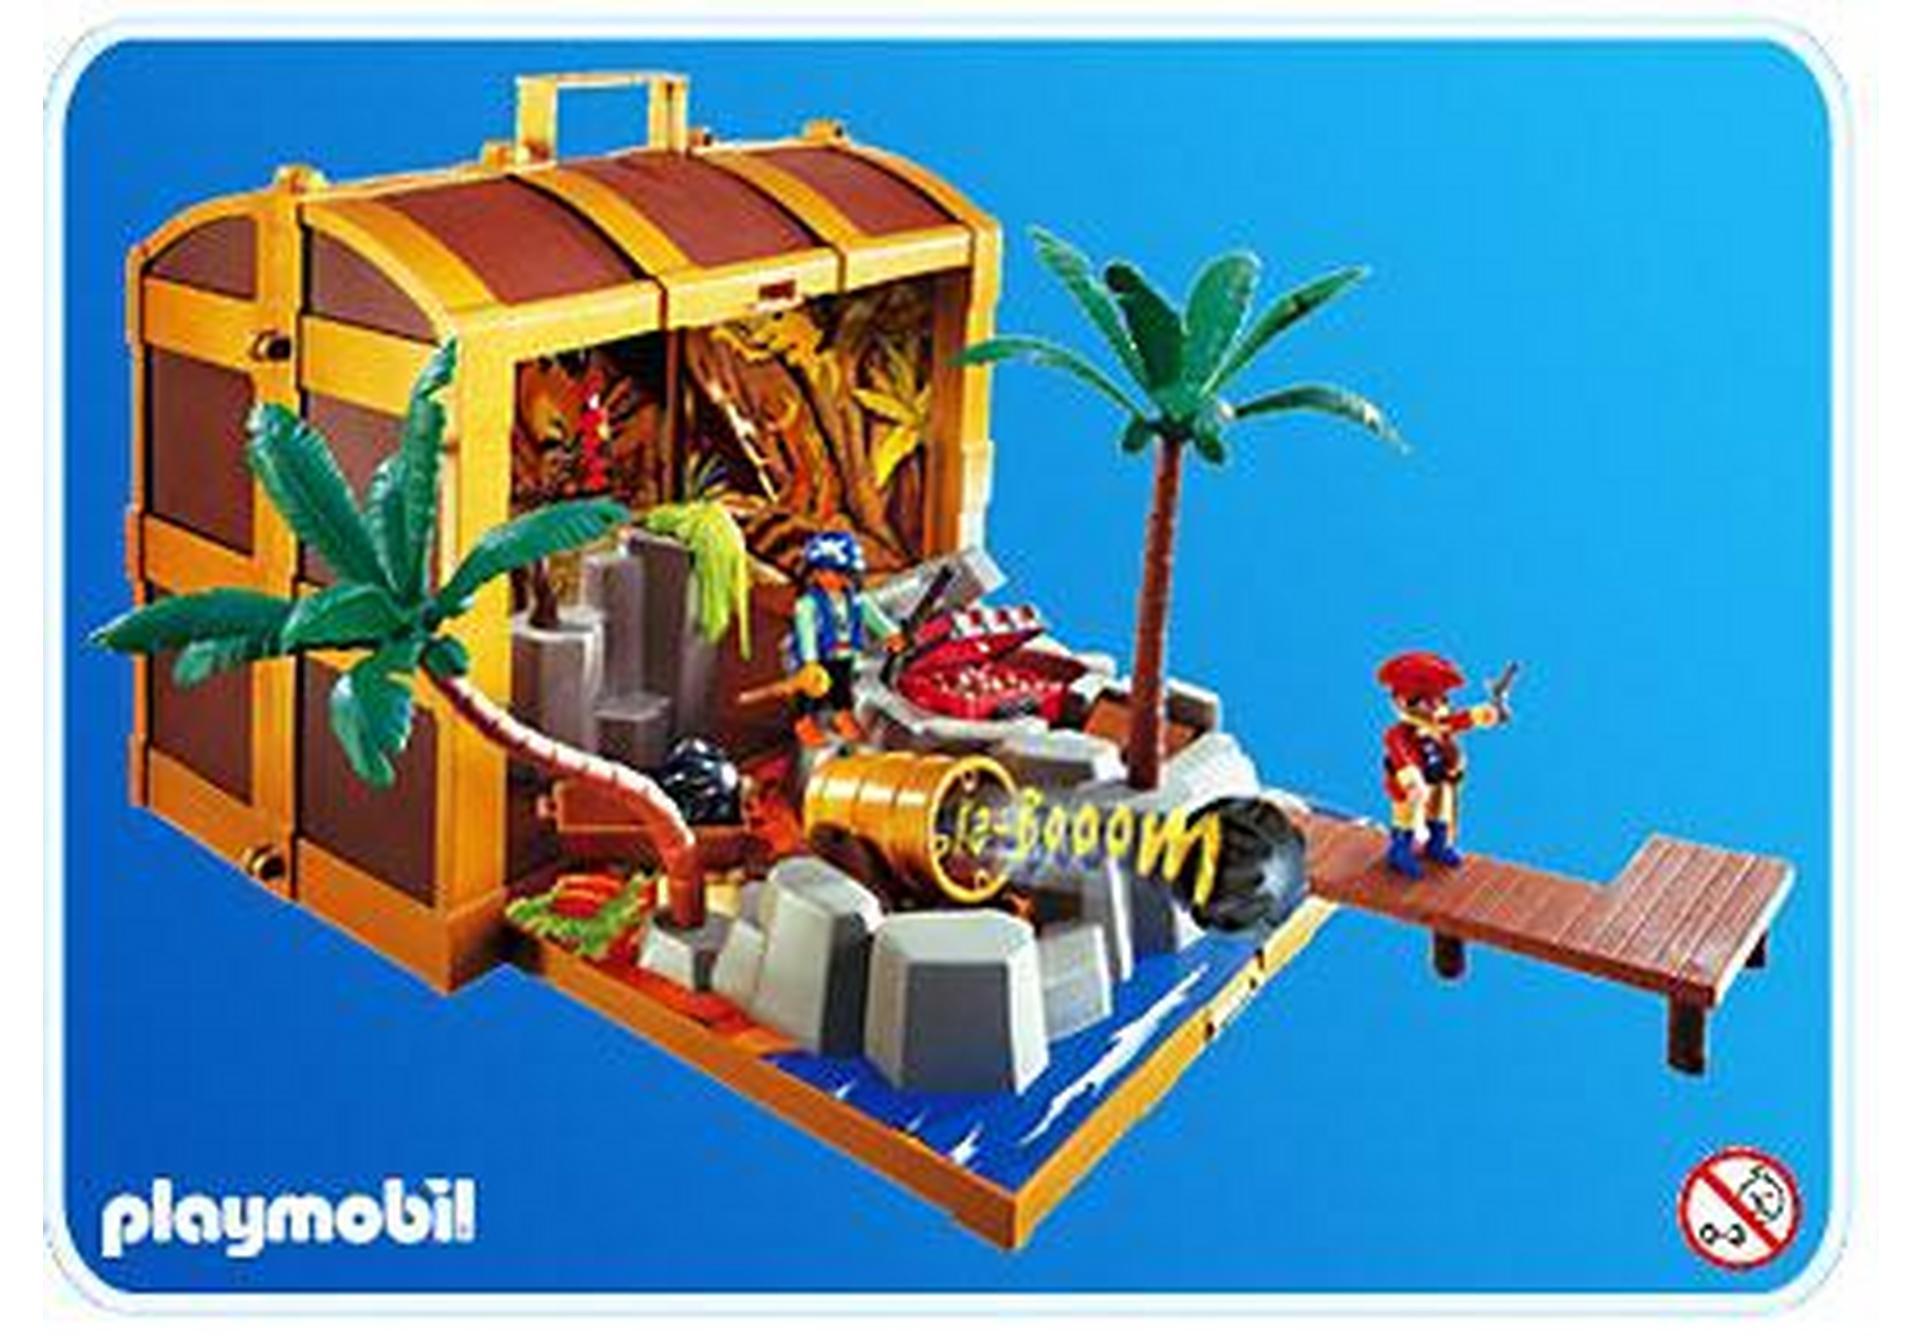 coffre au tr sor des pirates 4432 a playmobil france. Black Bedroom Furniture Sets. Home Design Ideas